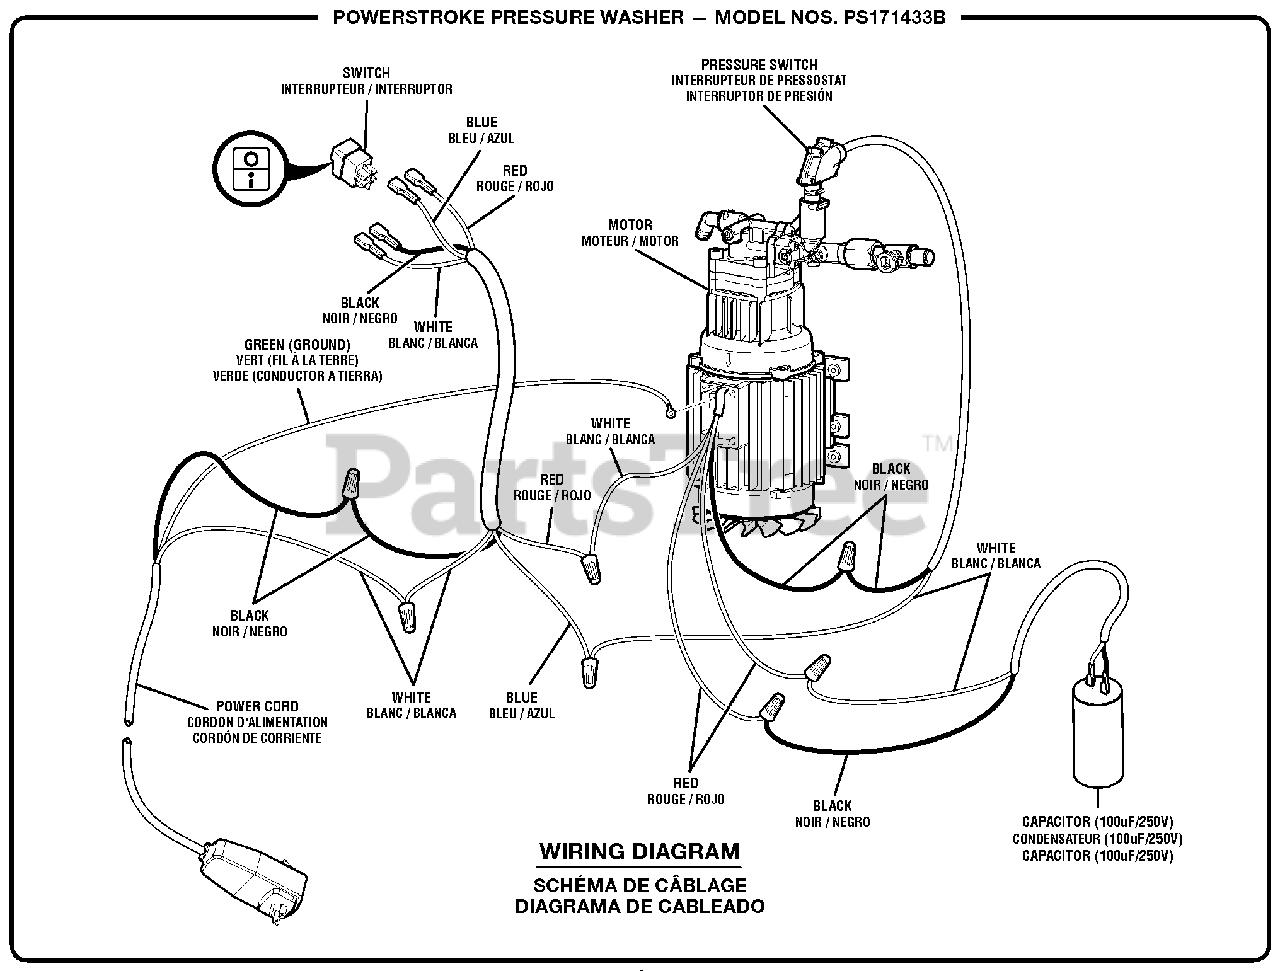 Washer Wiring Diagram